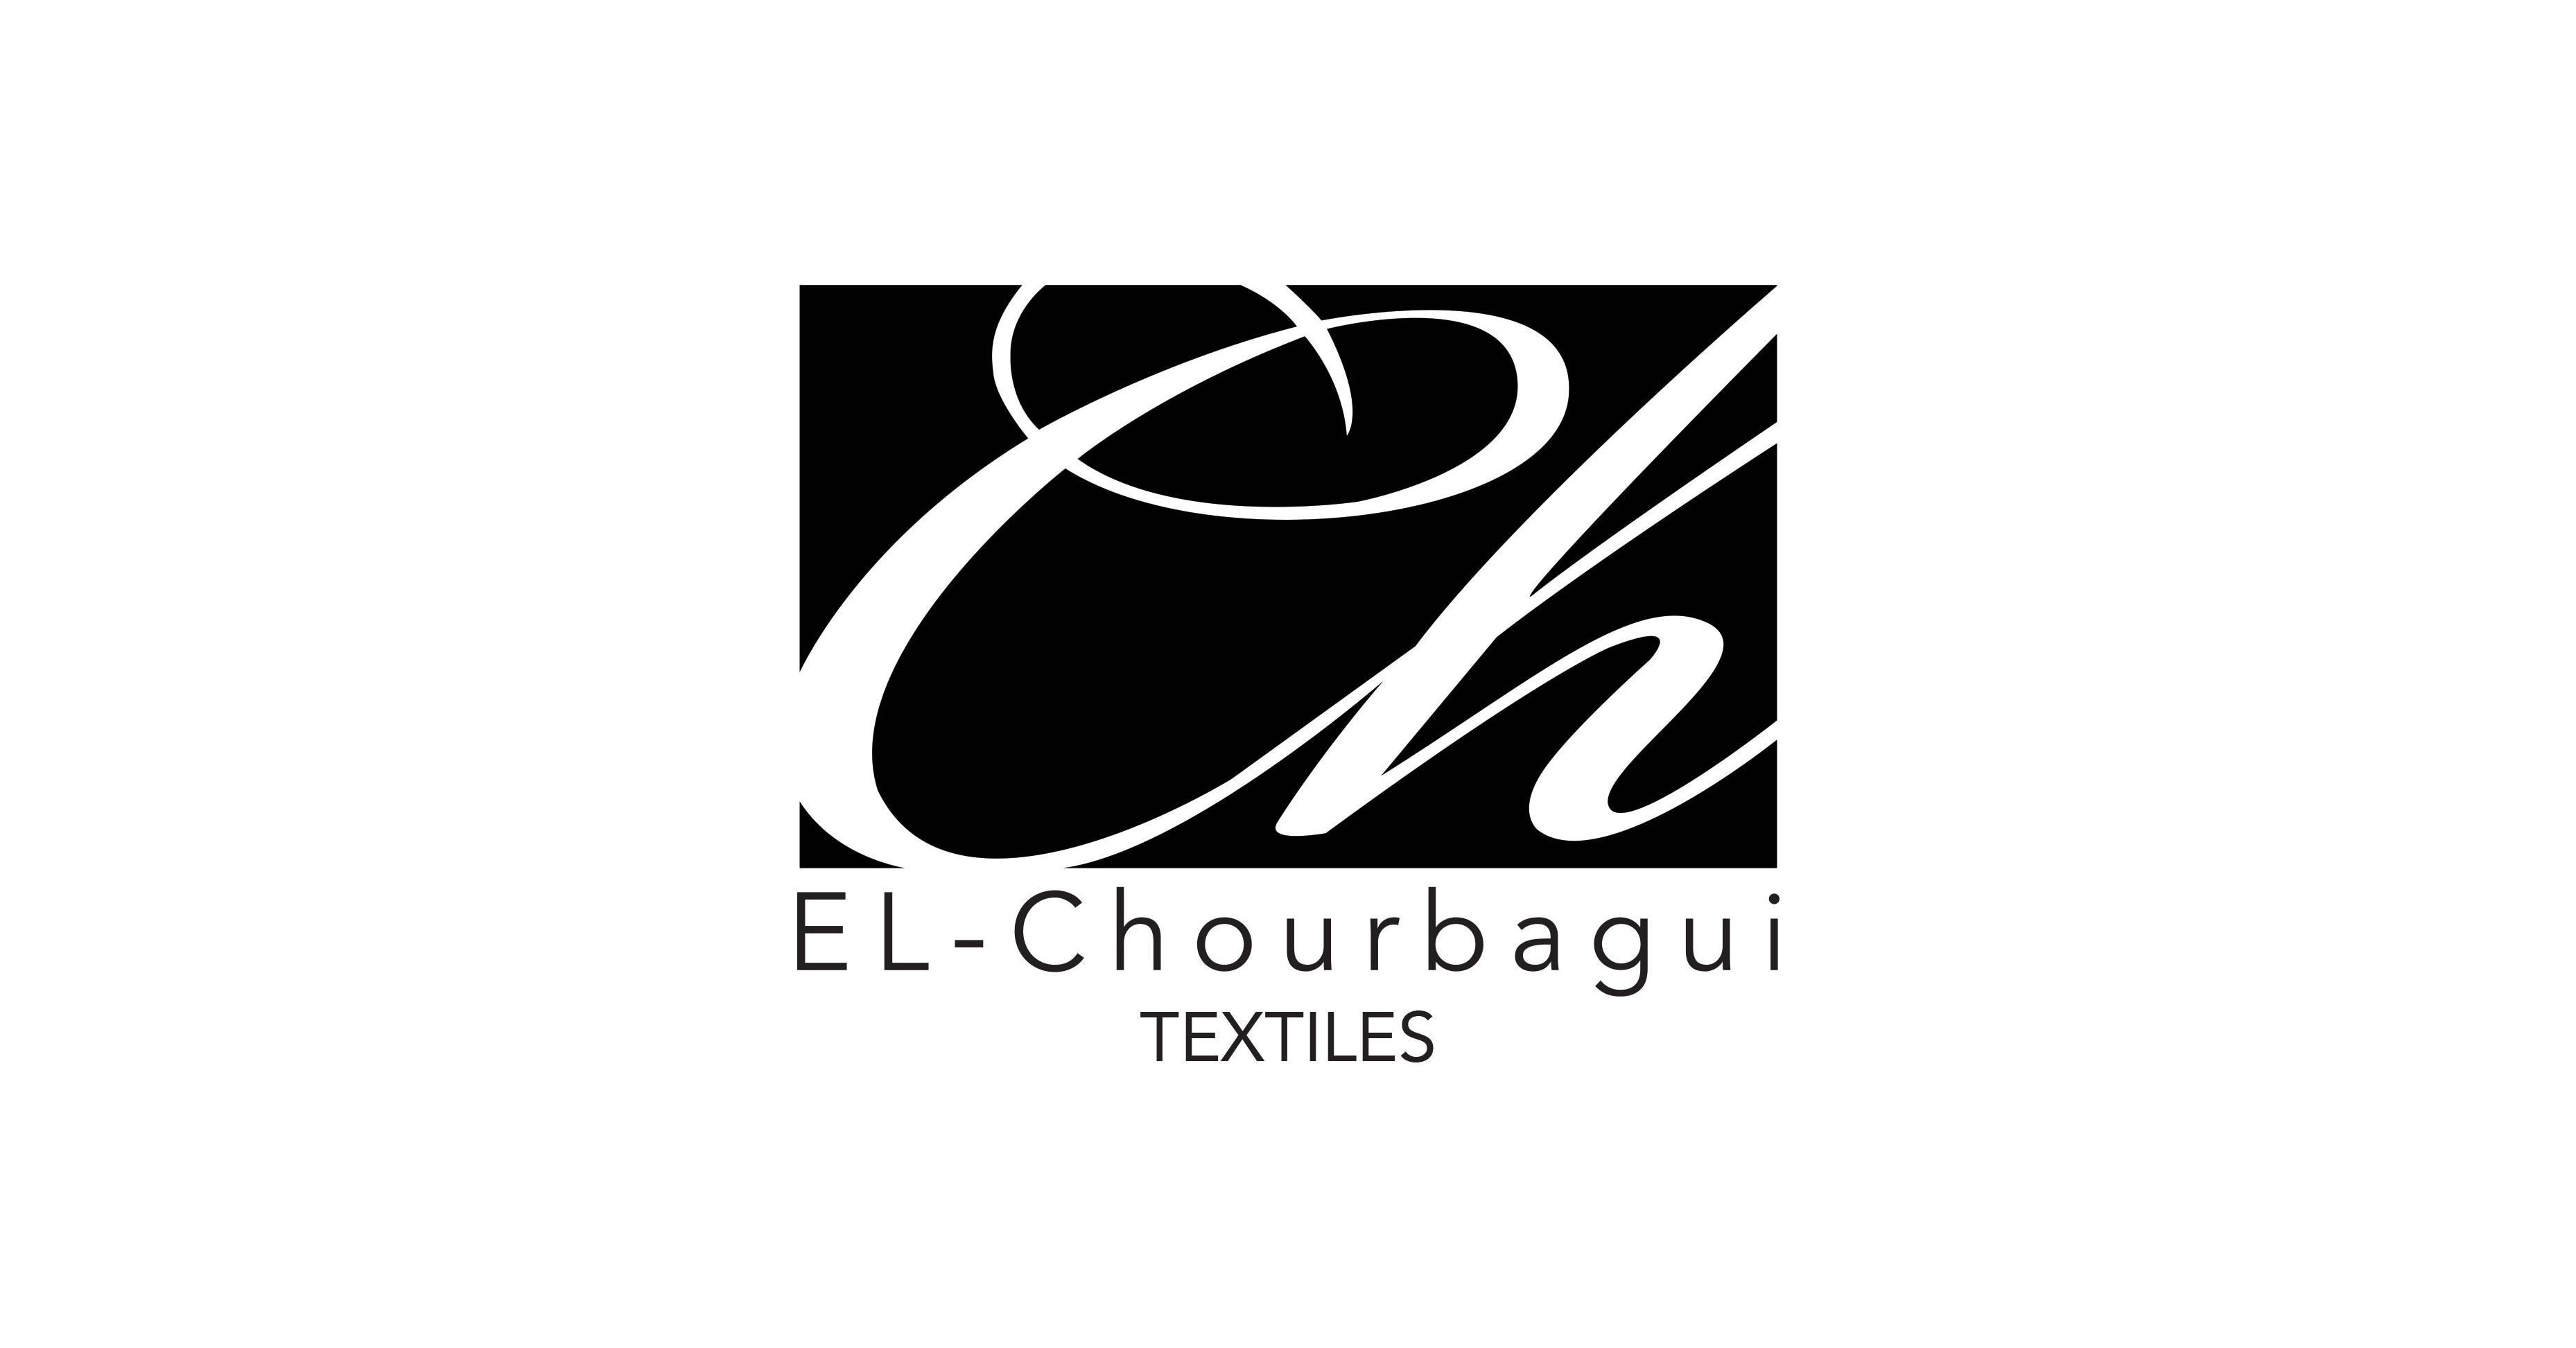 صورة Job: Textile Sales Executive at EL Chourbagui Textiles in Cairo, Egypt